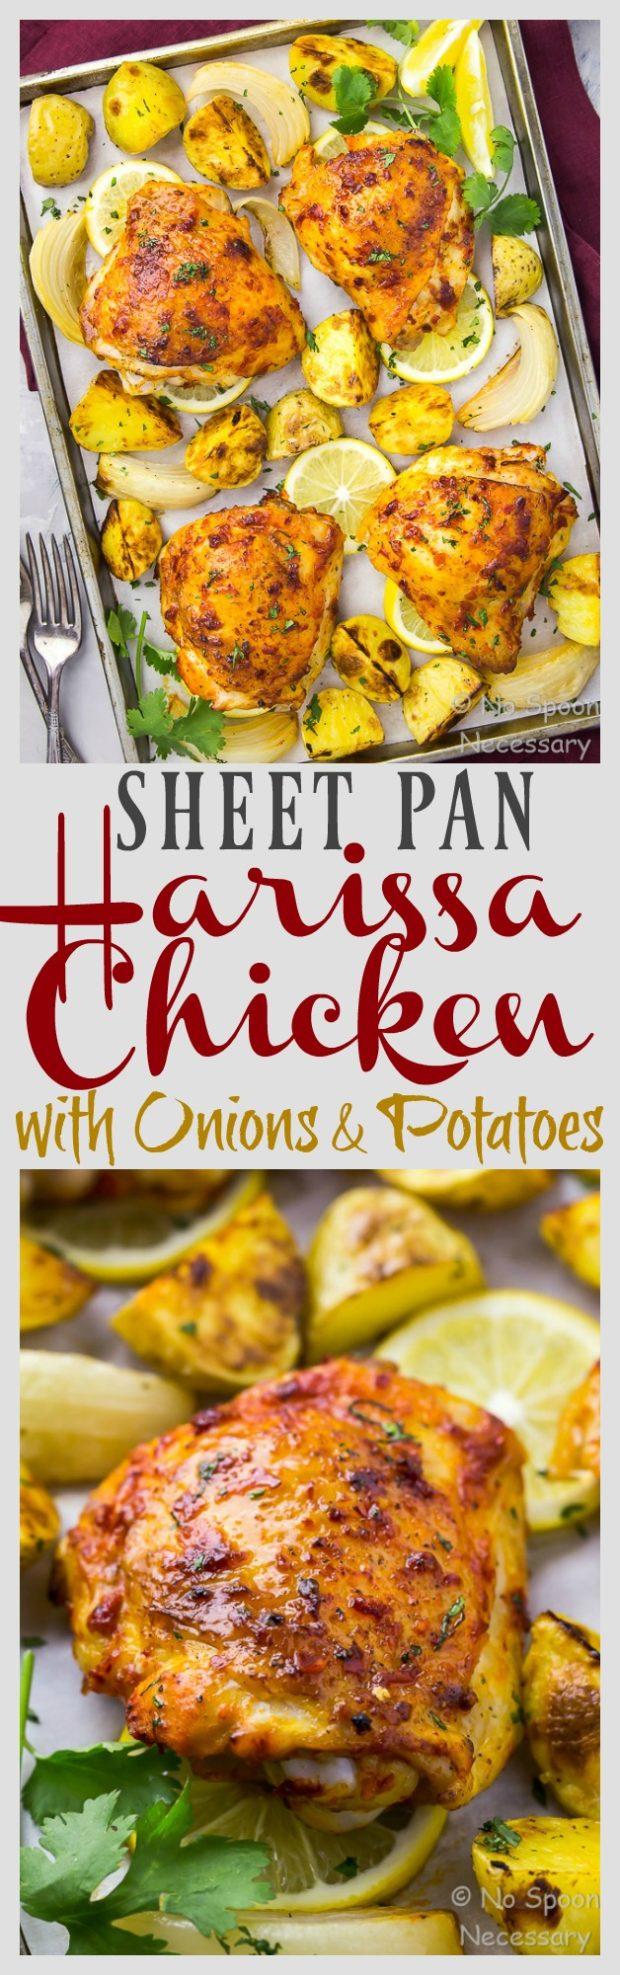 Sheet Pan Harissa Roasted Chicken Thighs, Potatoes & Onions